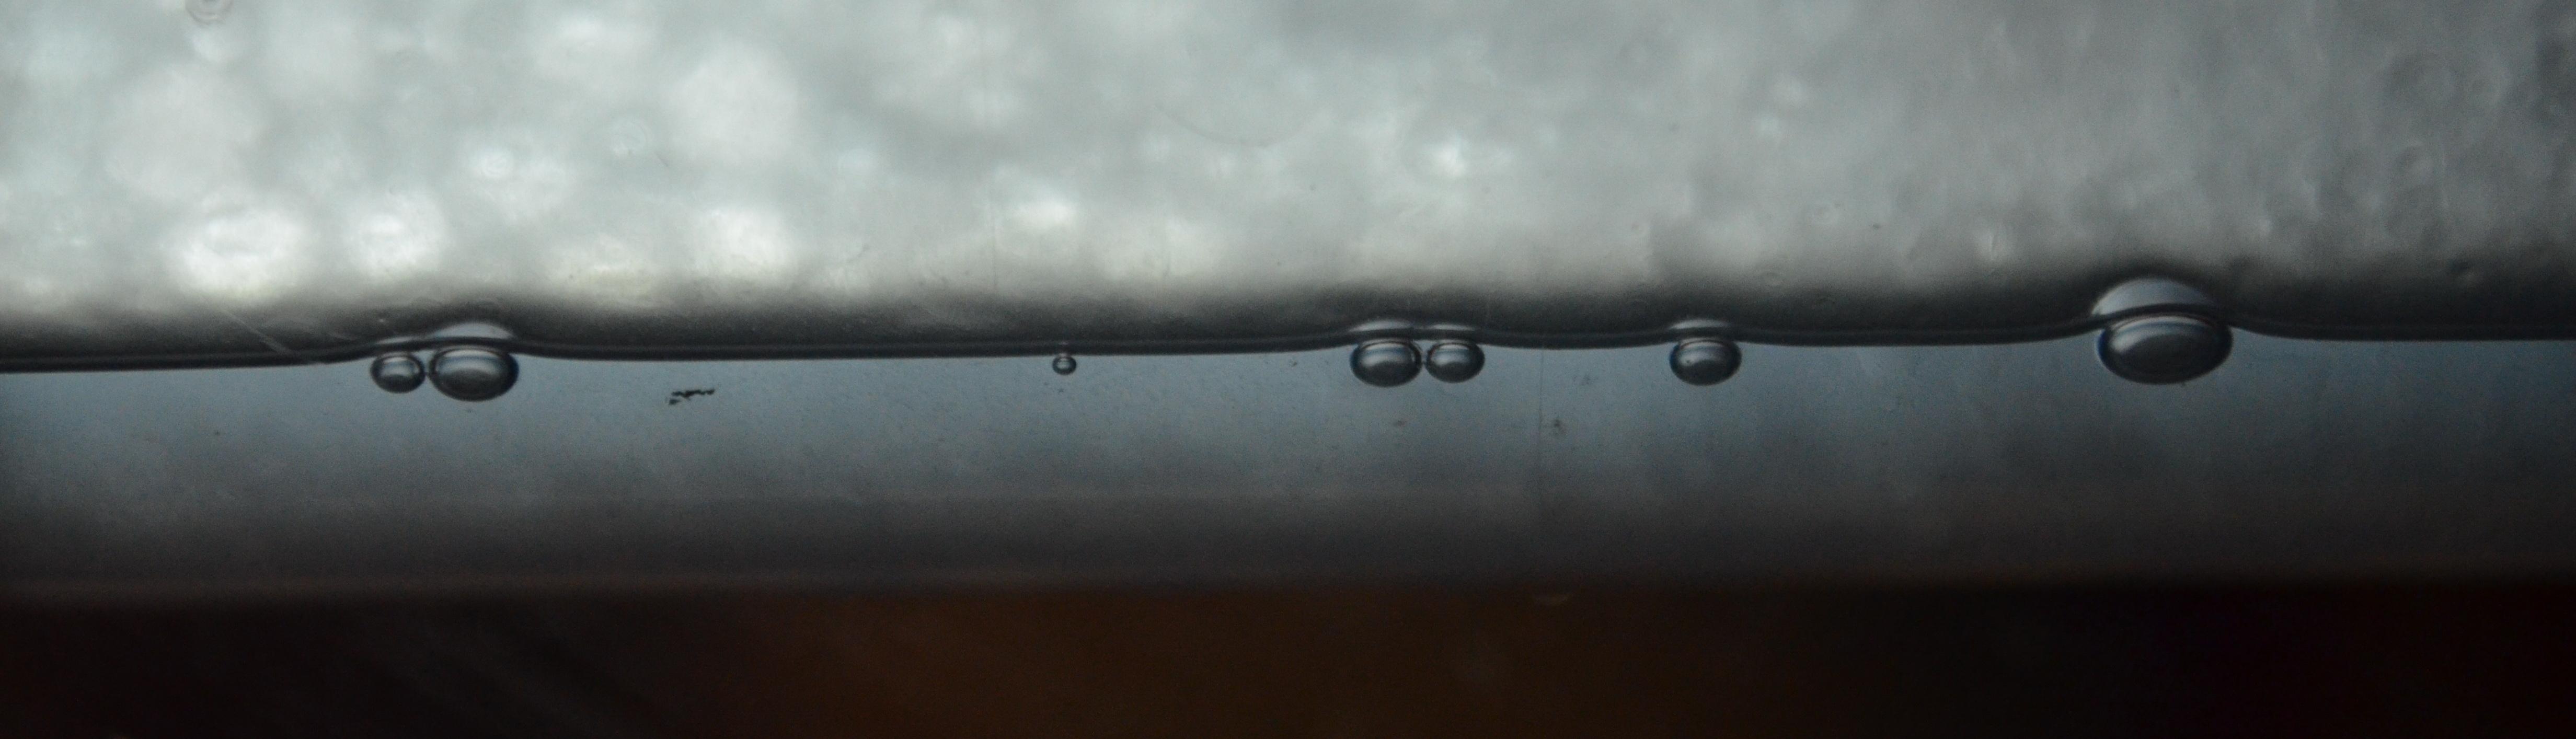 Floating by chronogram